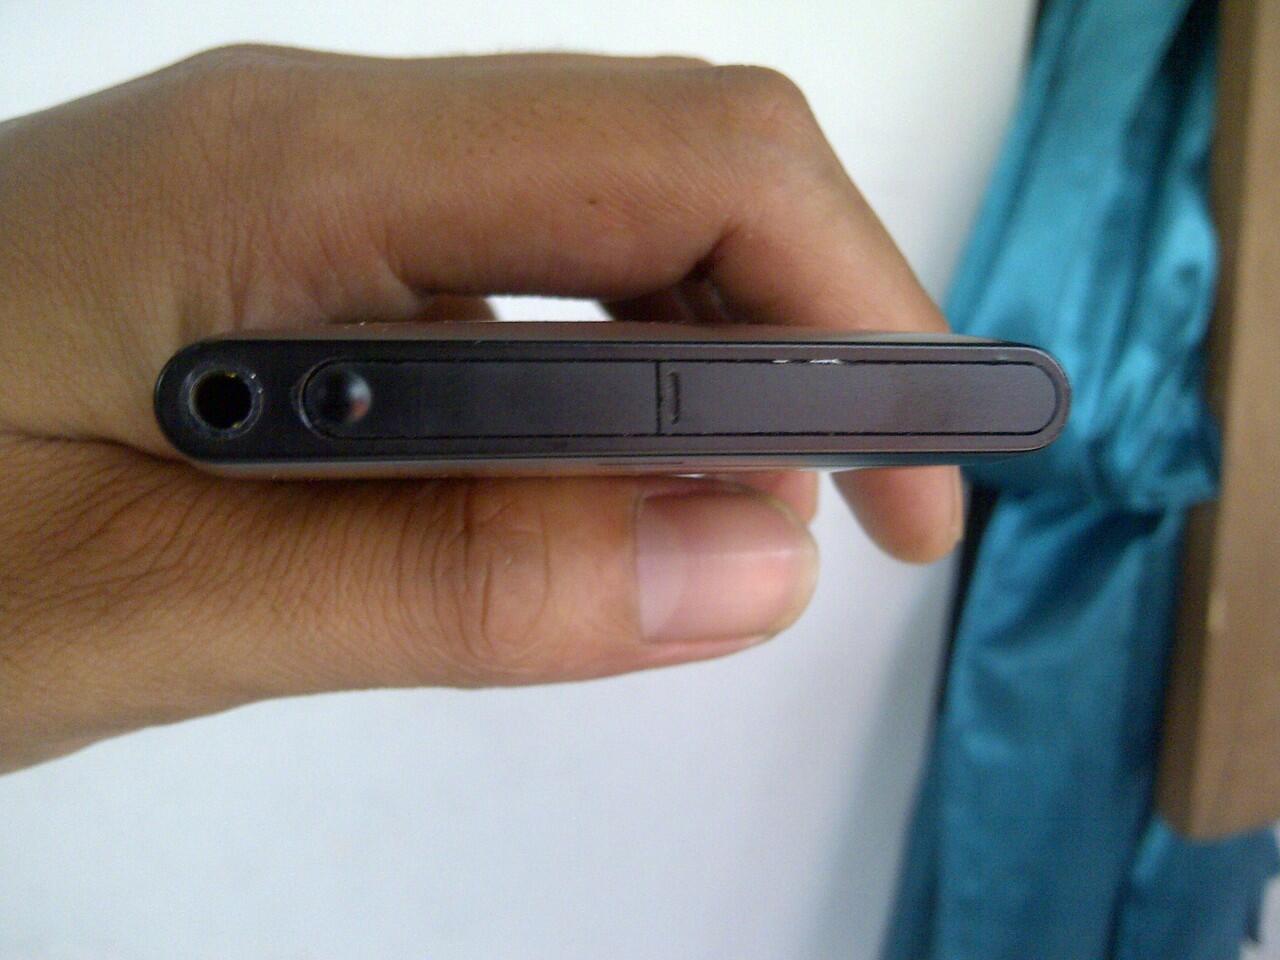 lumia 800 windows phone 7.8 warna hitam 16gb MURMER